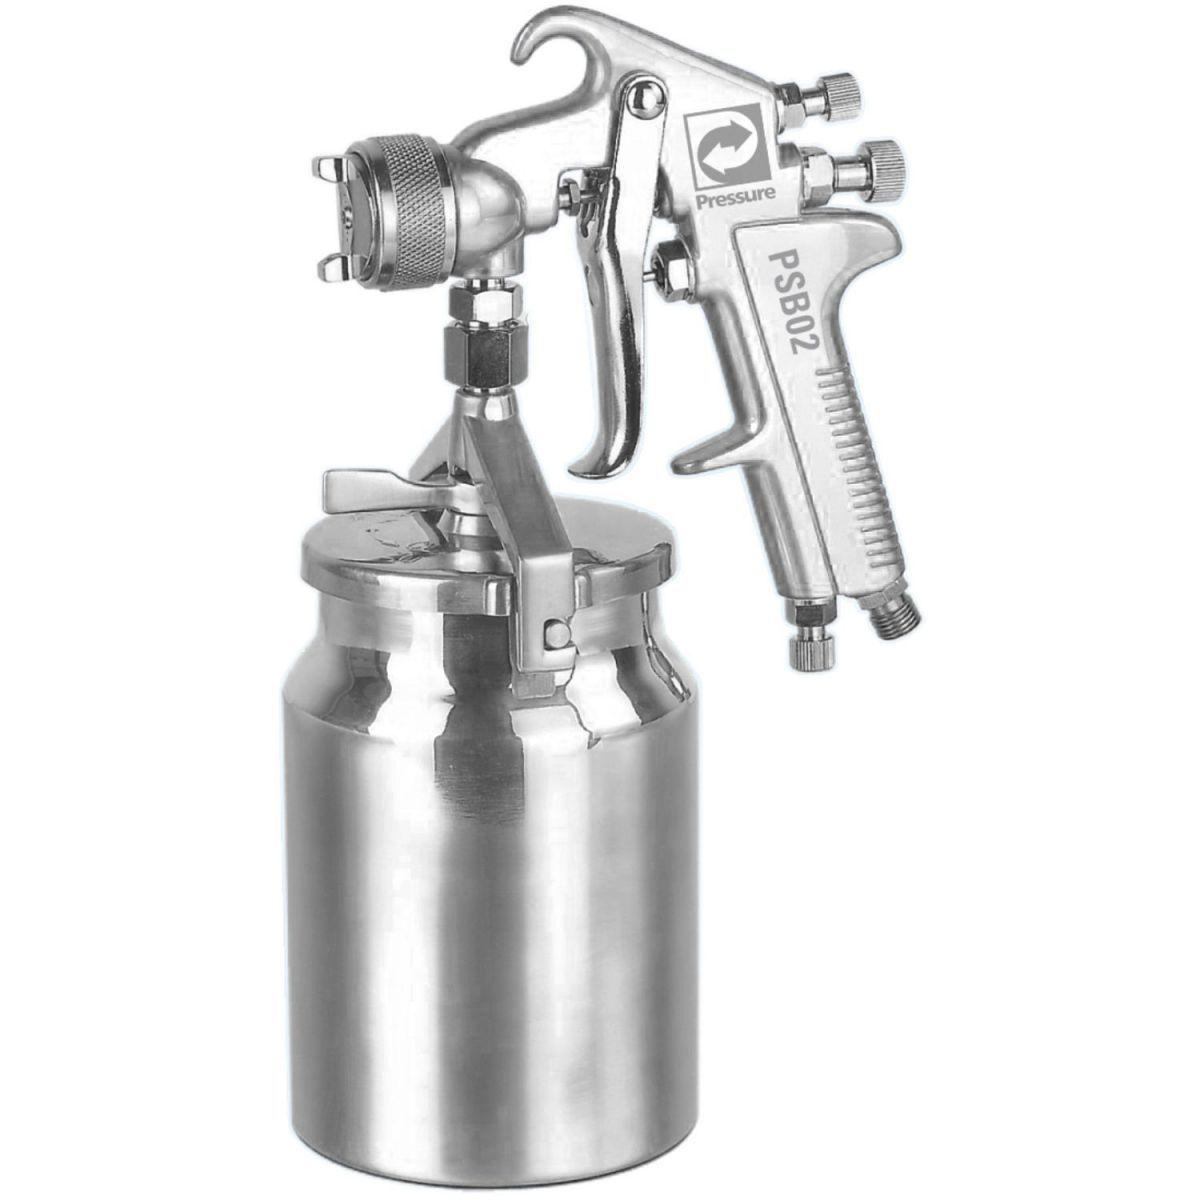 Pistola de Pintura Baixa Produção PSB02 - PRESSURE